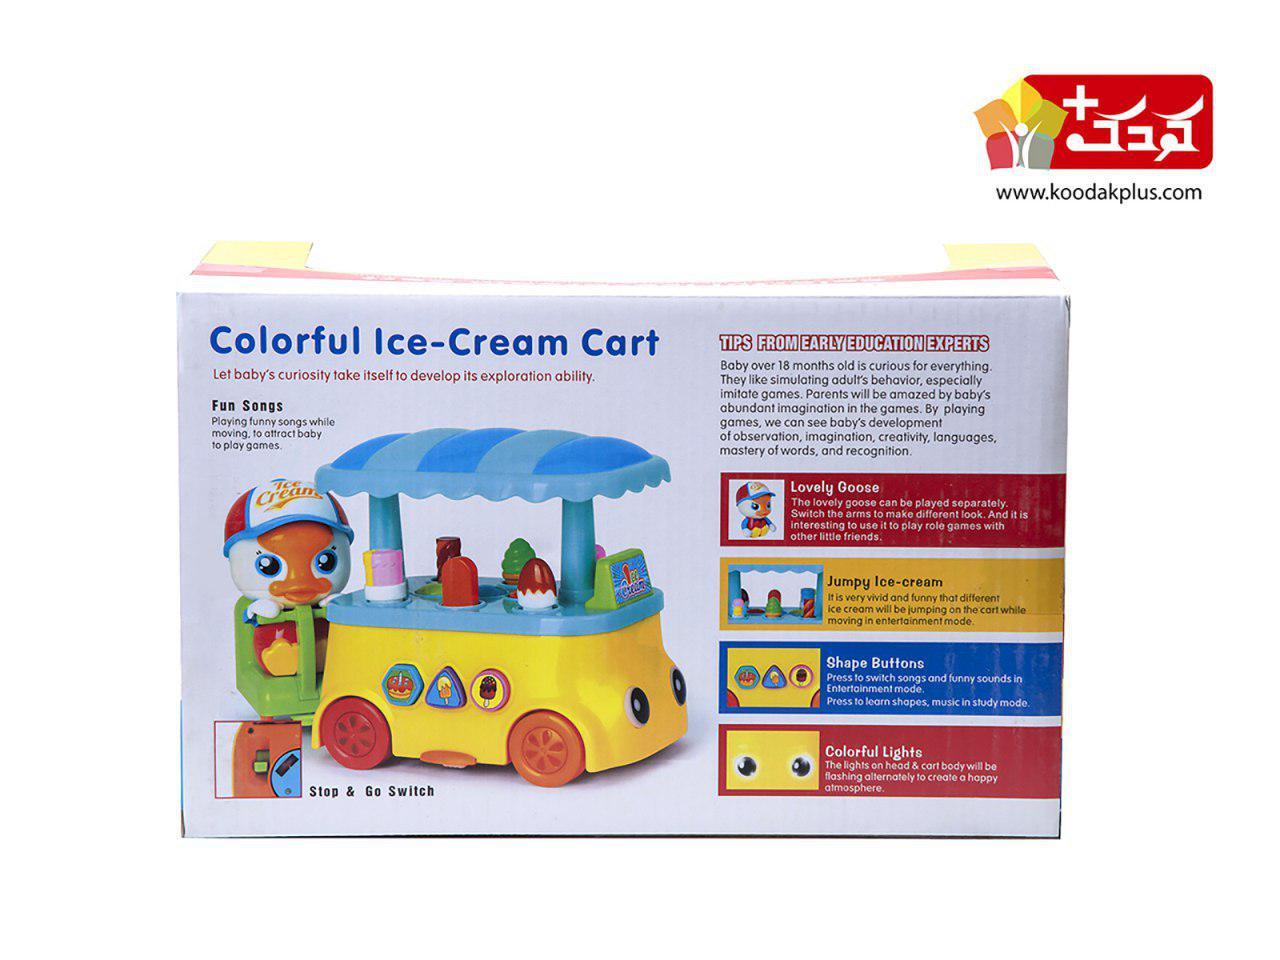 ice-cream cart/6101ماشین بستنی فروش هولی تویز موزیکال حرکتی